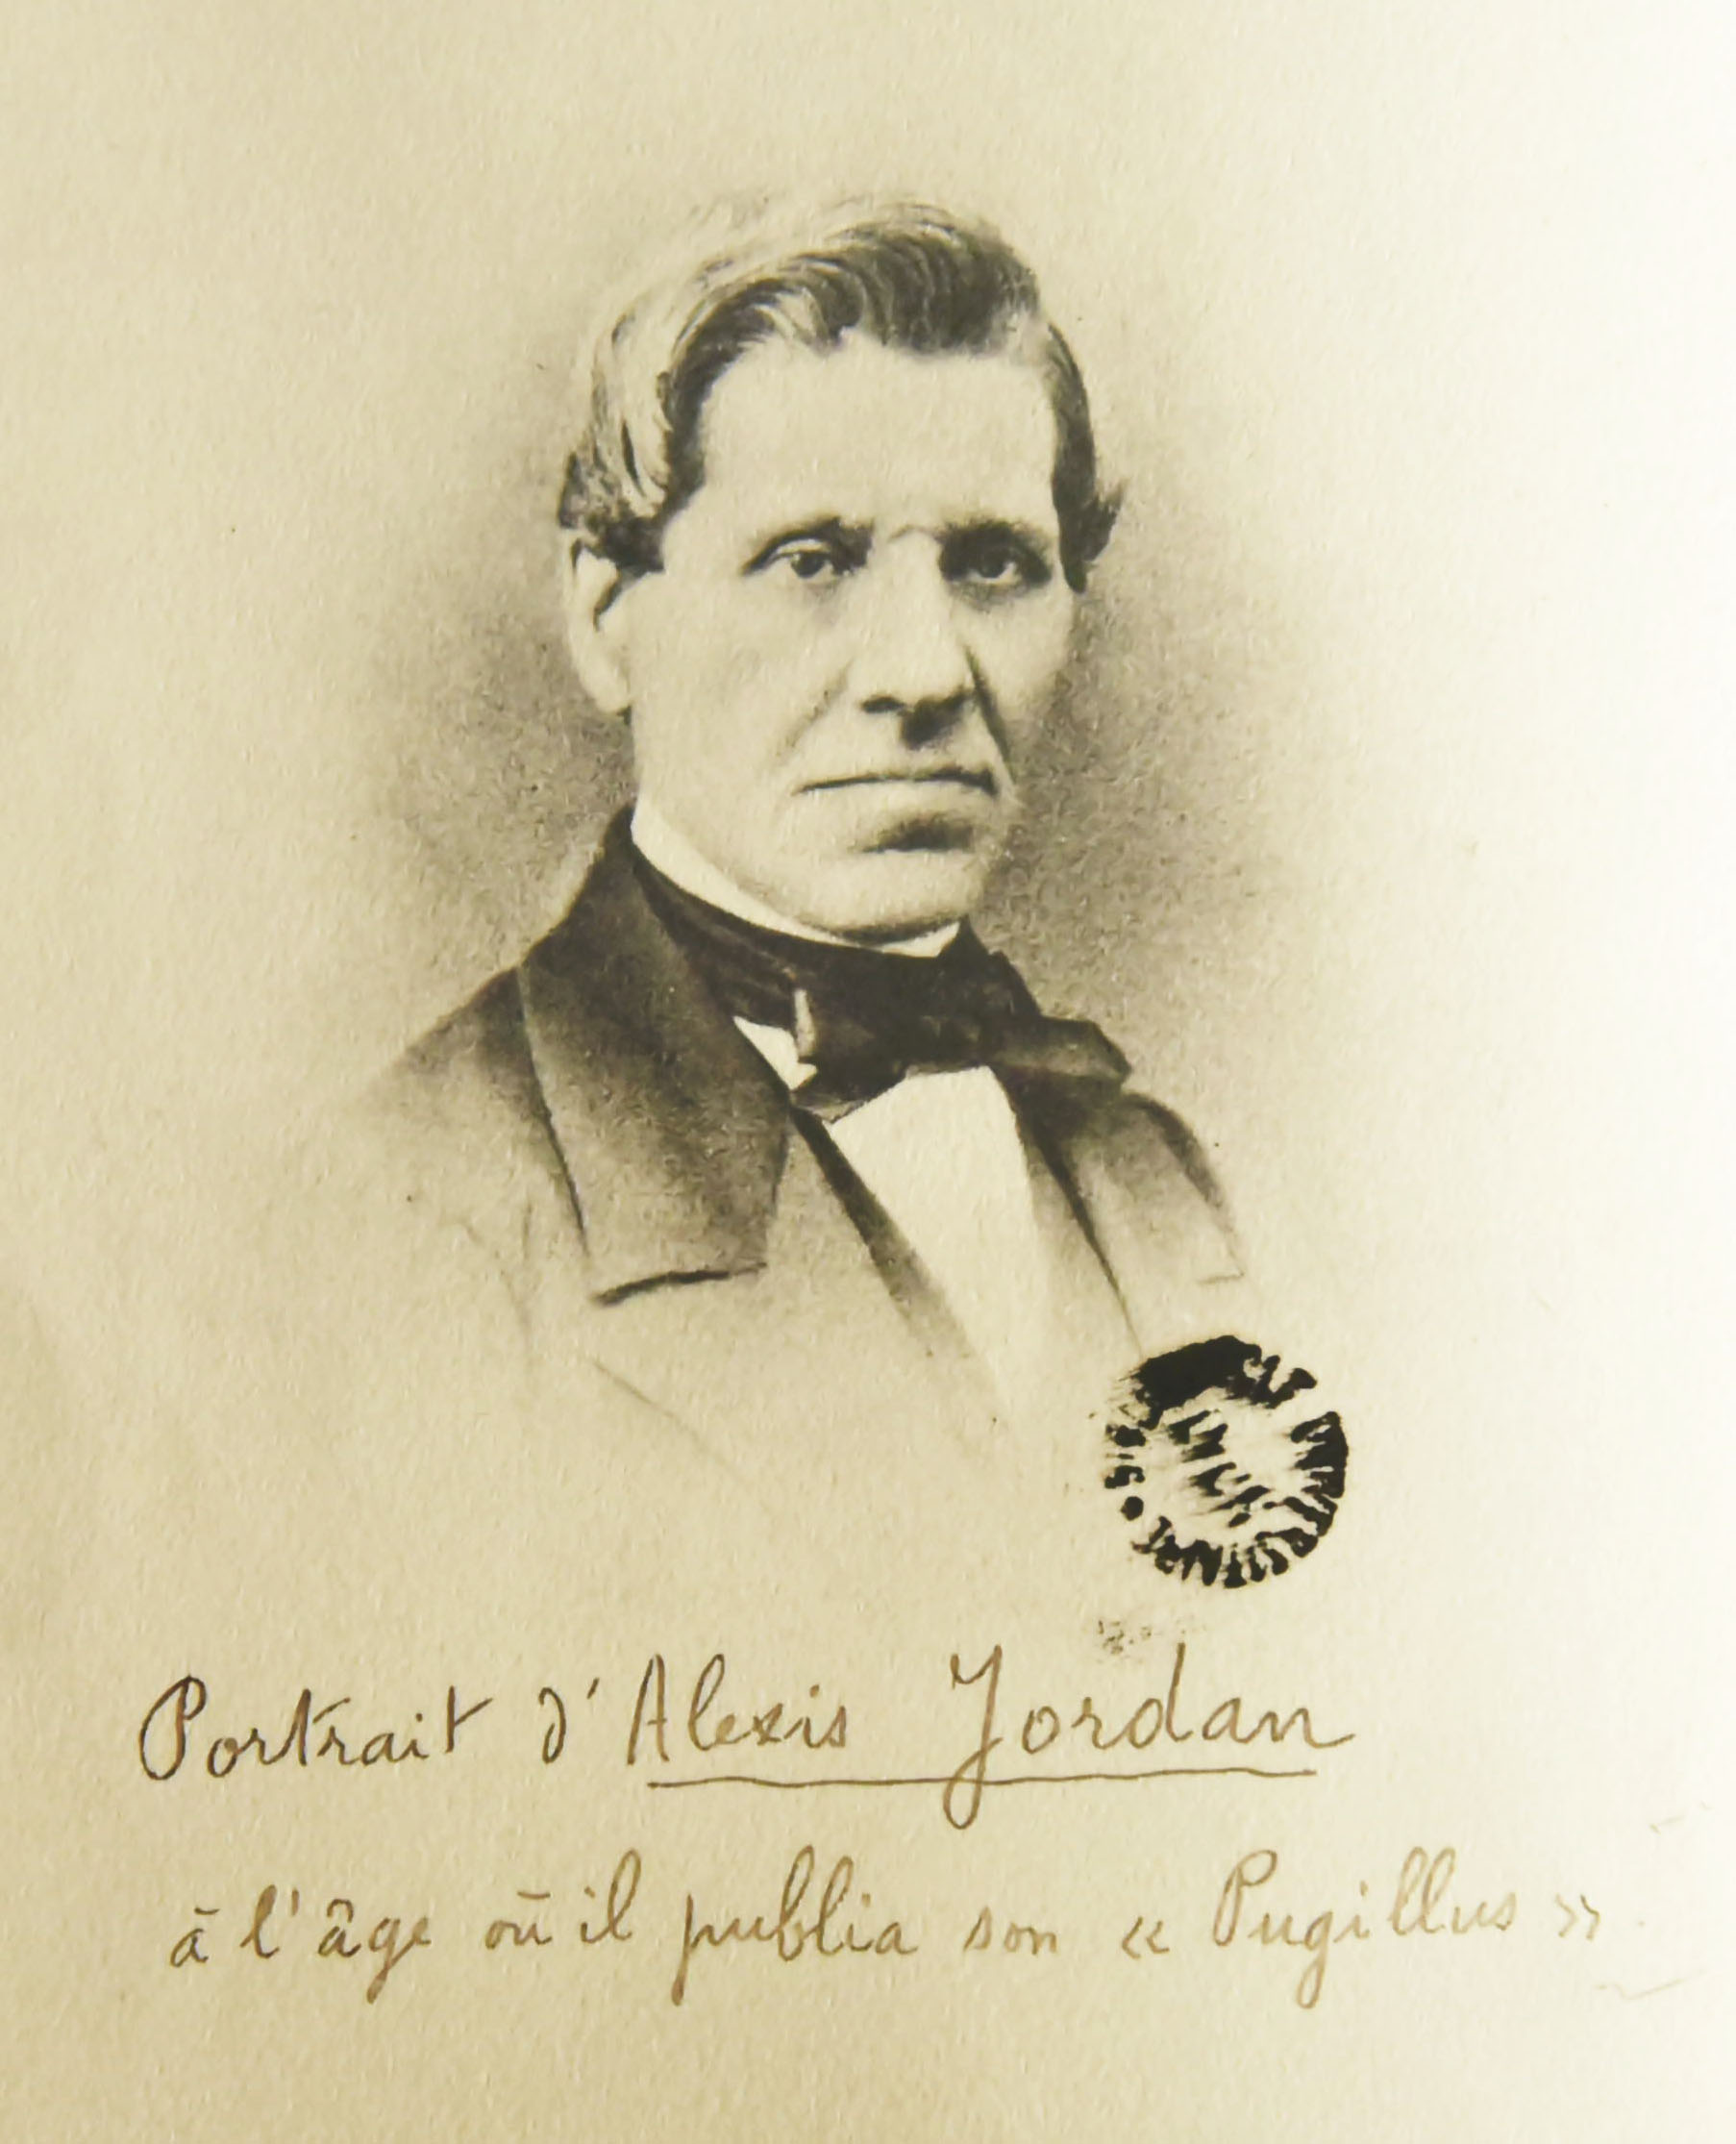 Alexis Jordan - 12